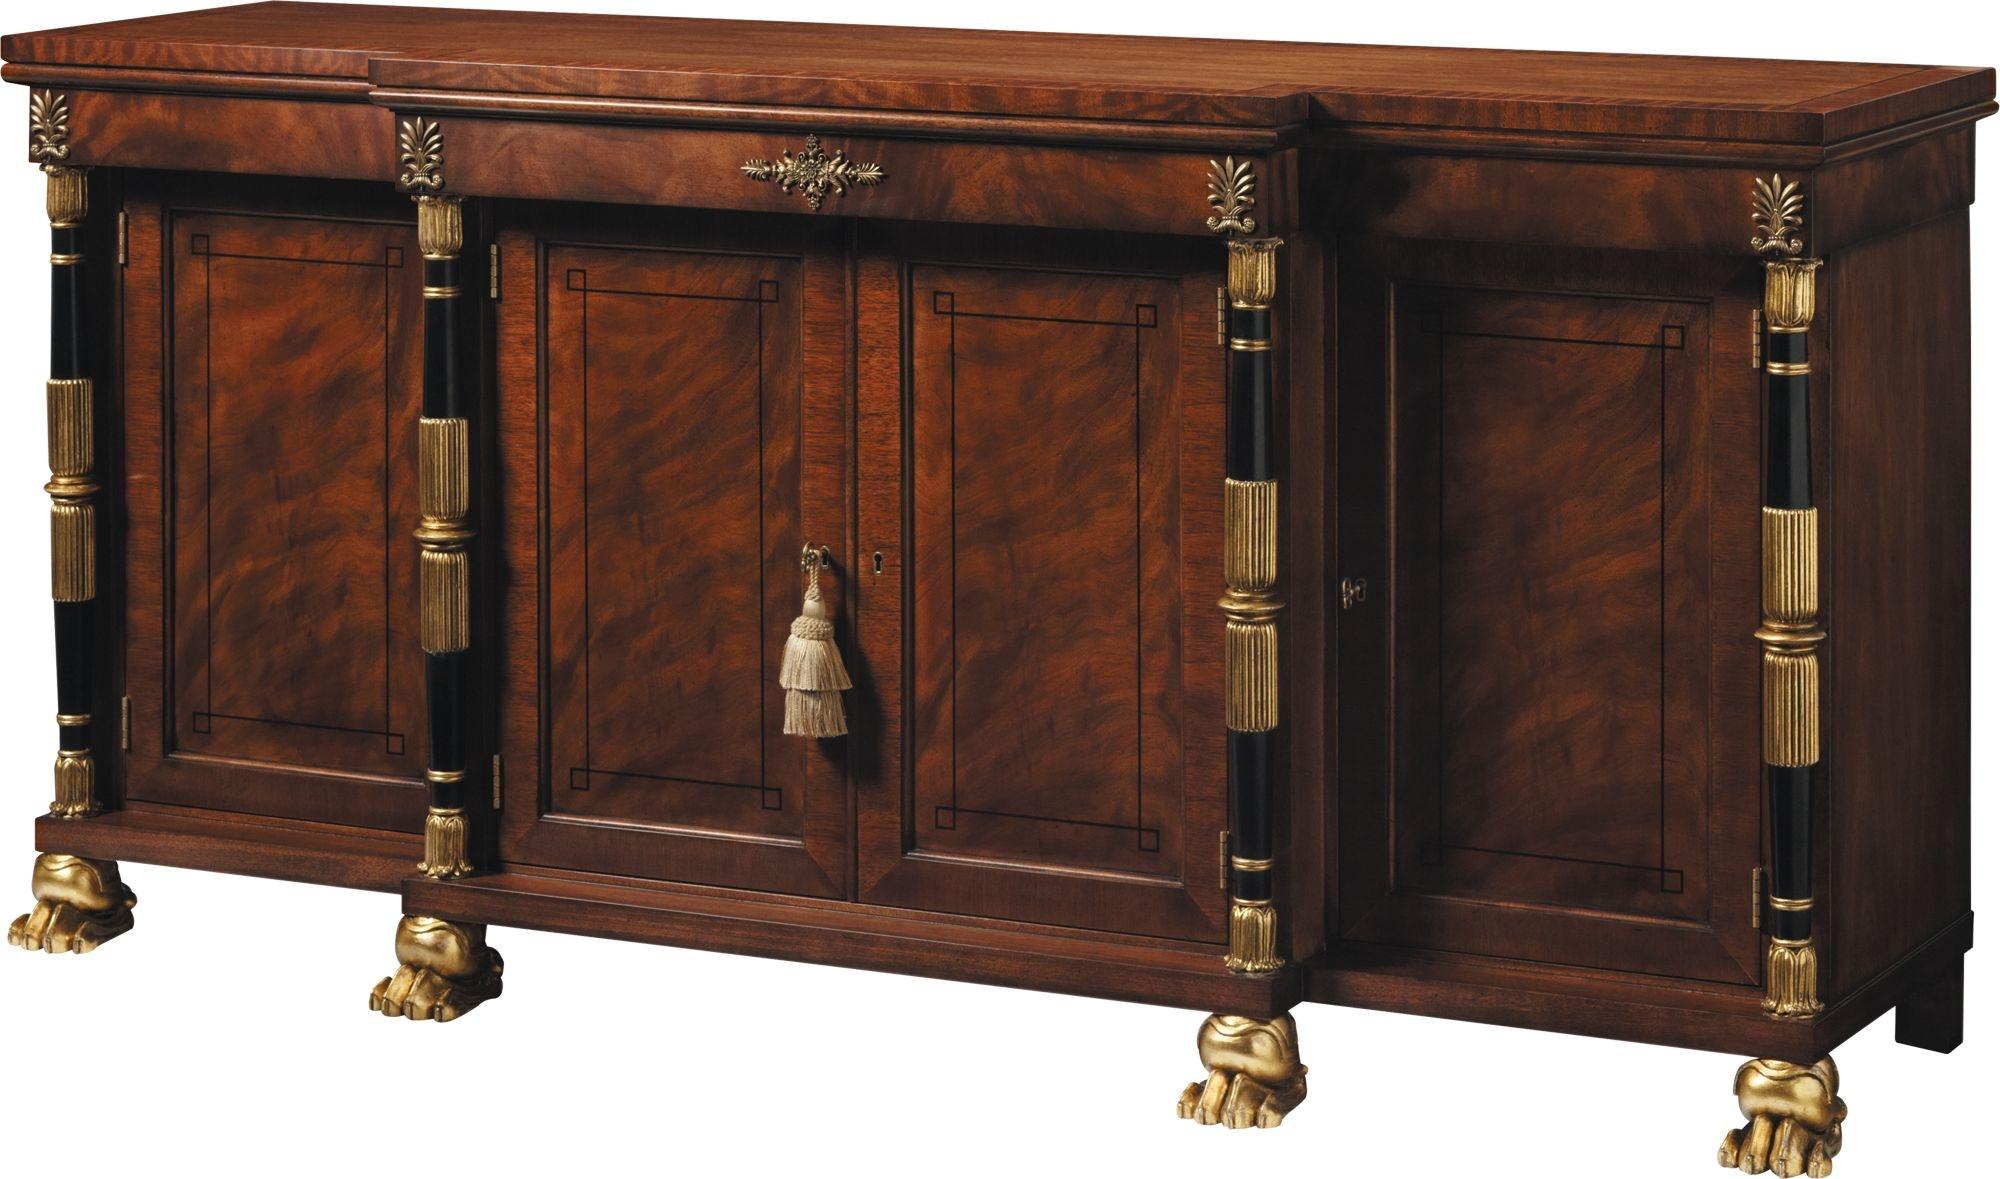 Baker Furniture Stately Homes Breakfront Cabinet 5332